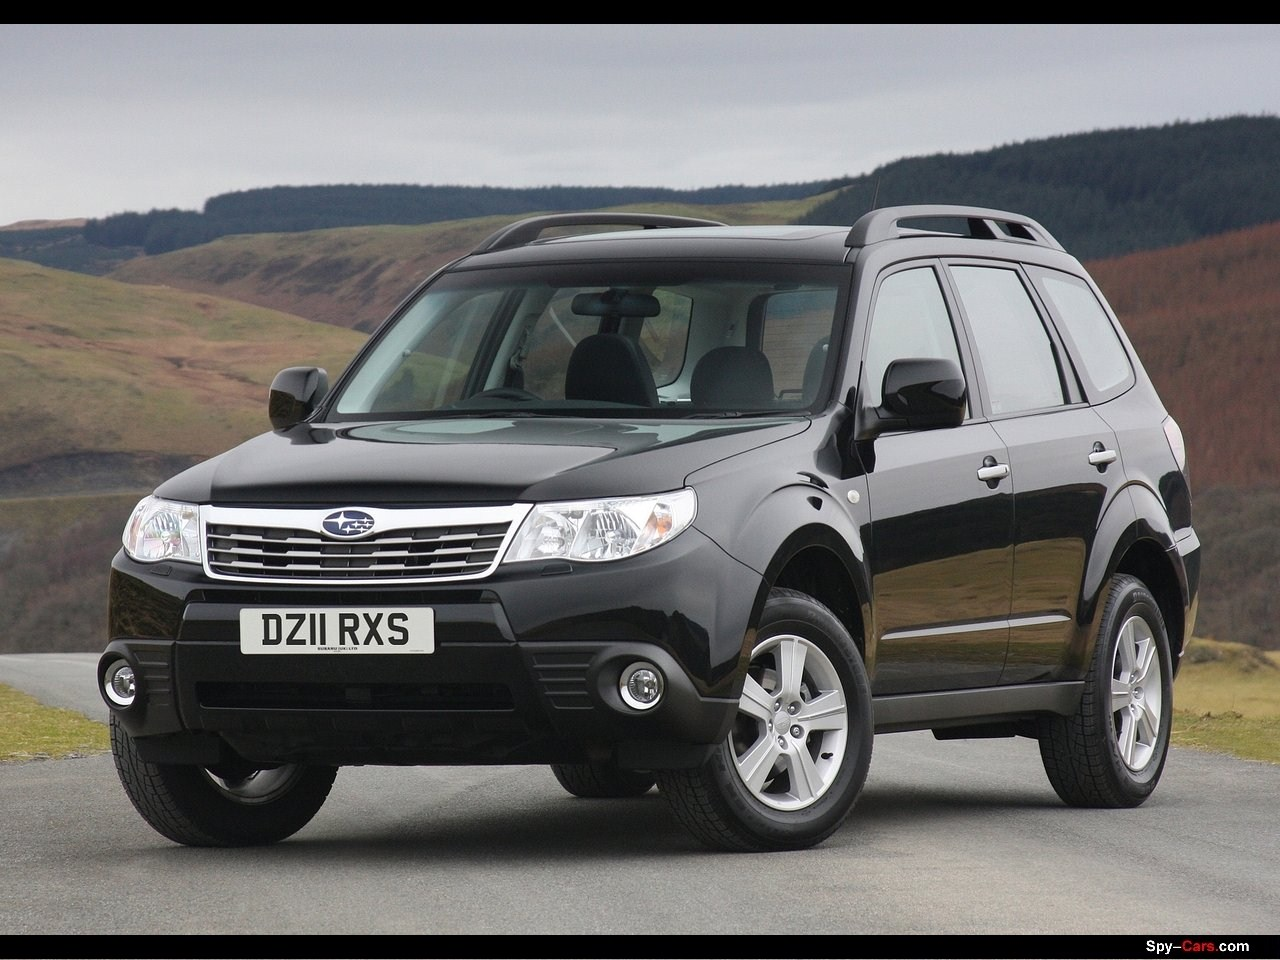 Subaru - Auto twenty-first century: 2011 Subaru Forester